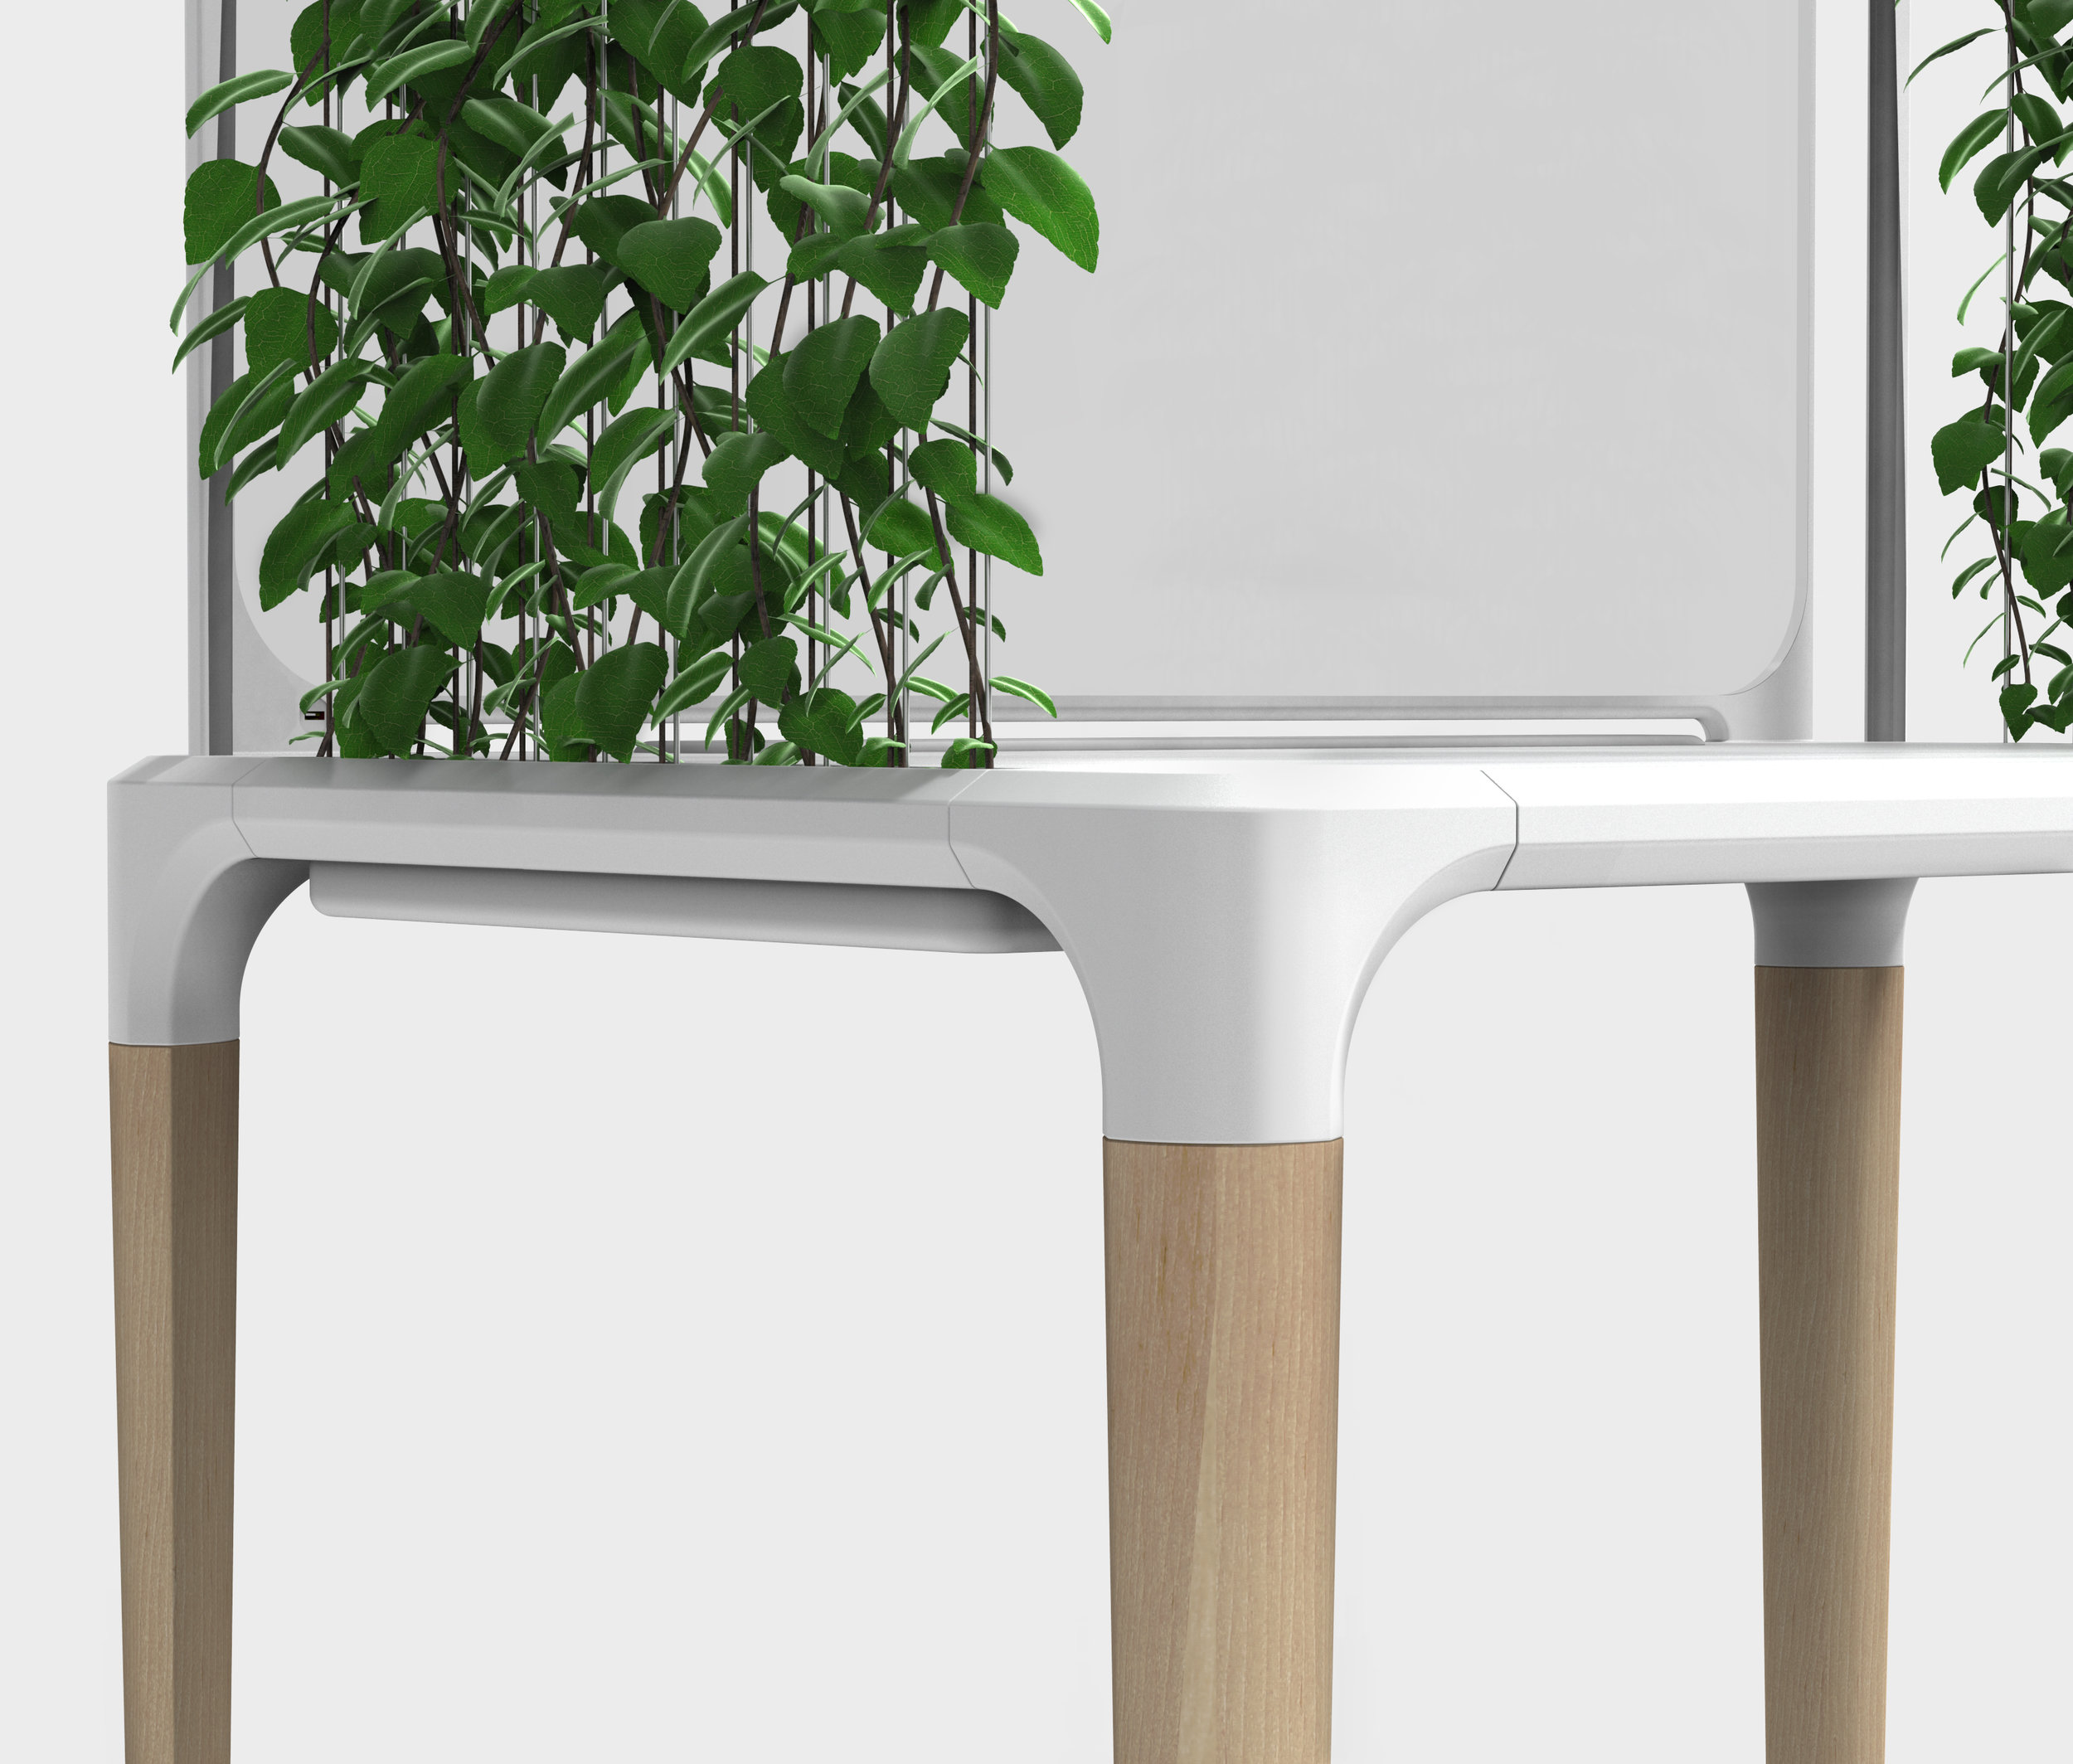 desk with plants.172.jpg